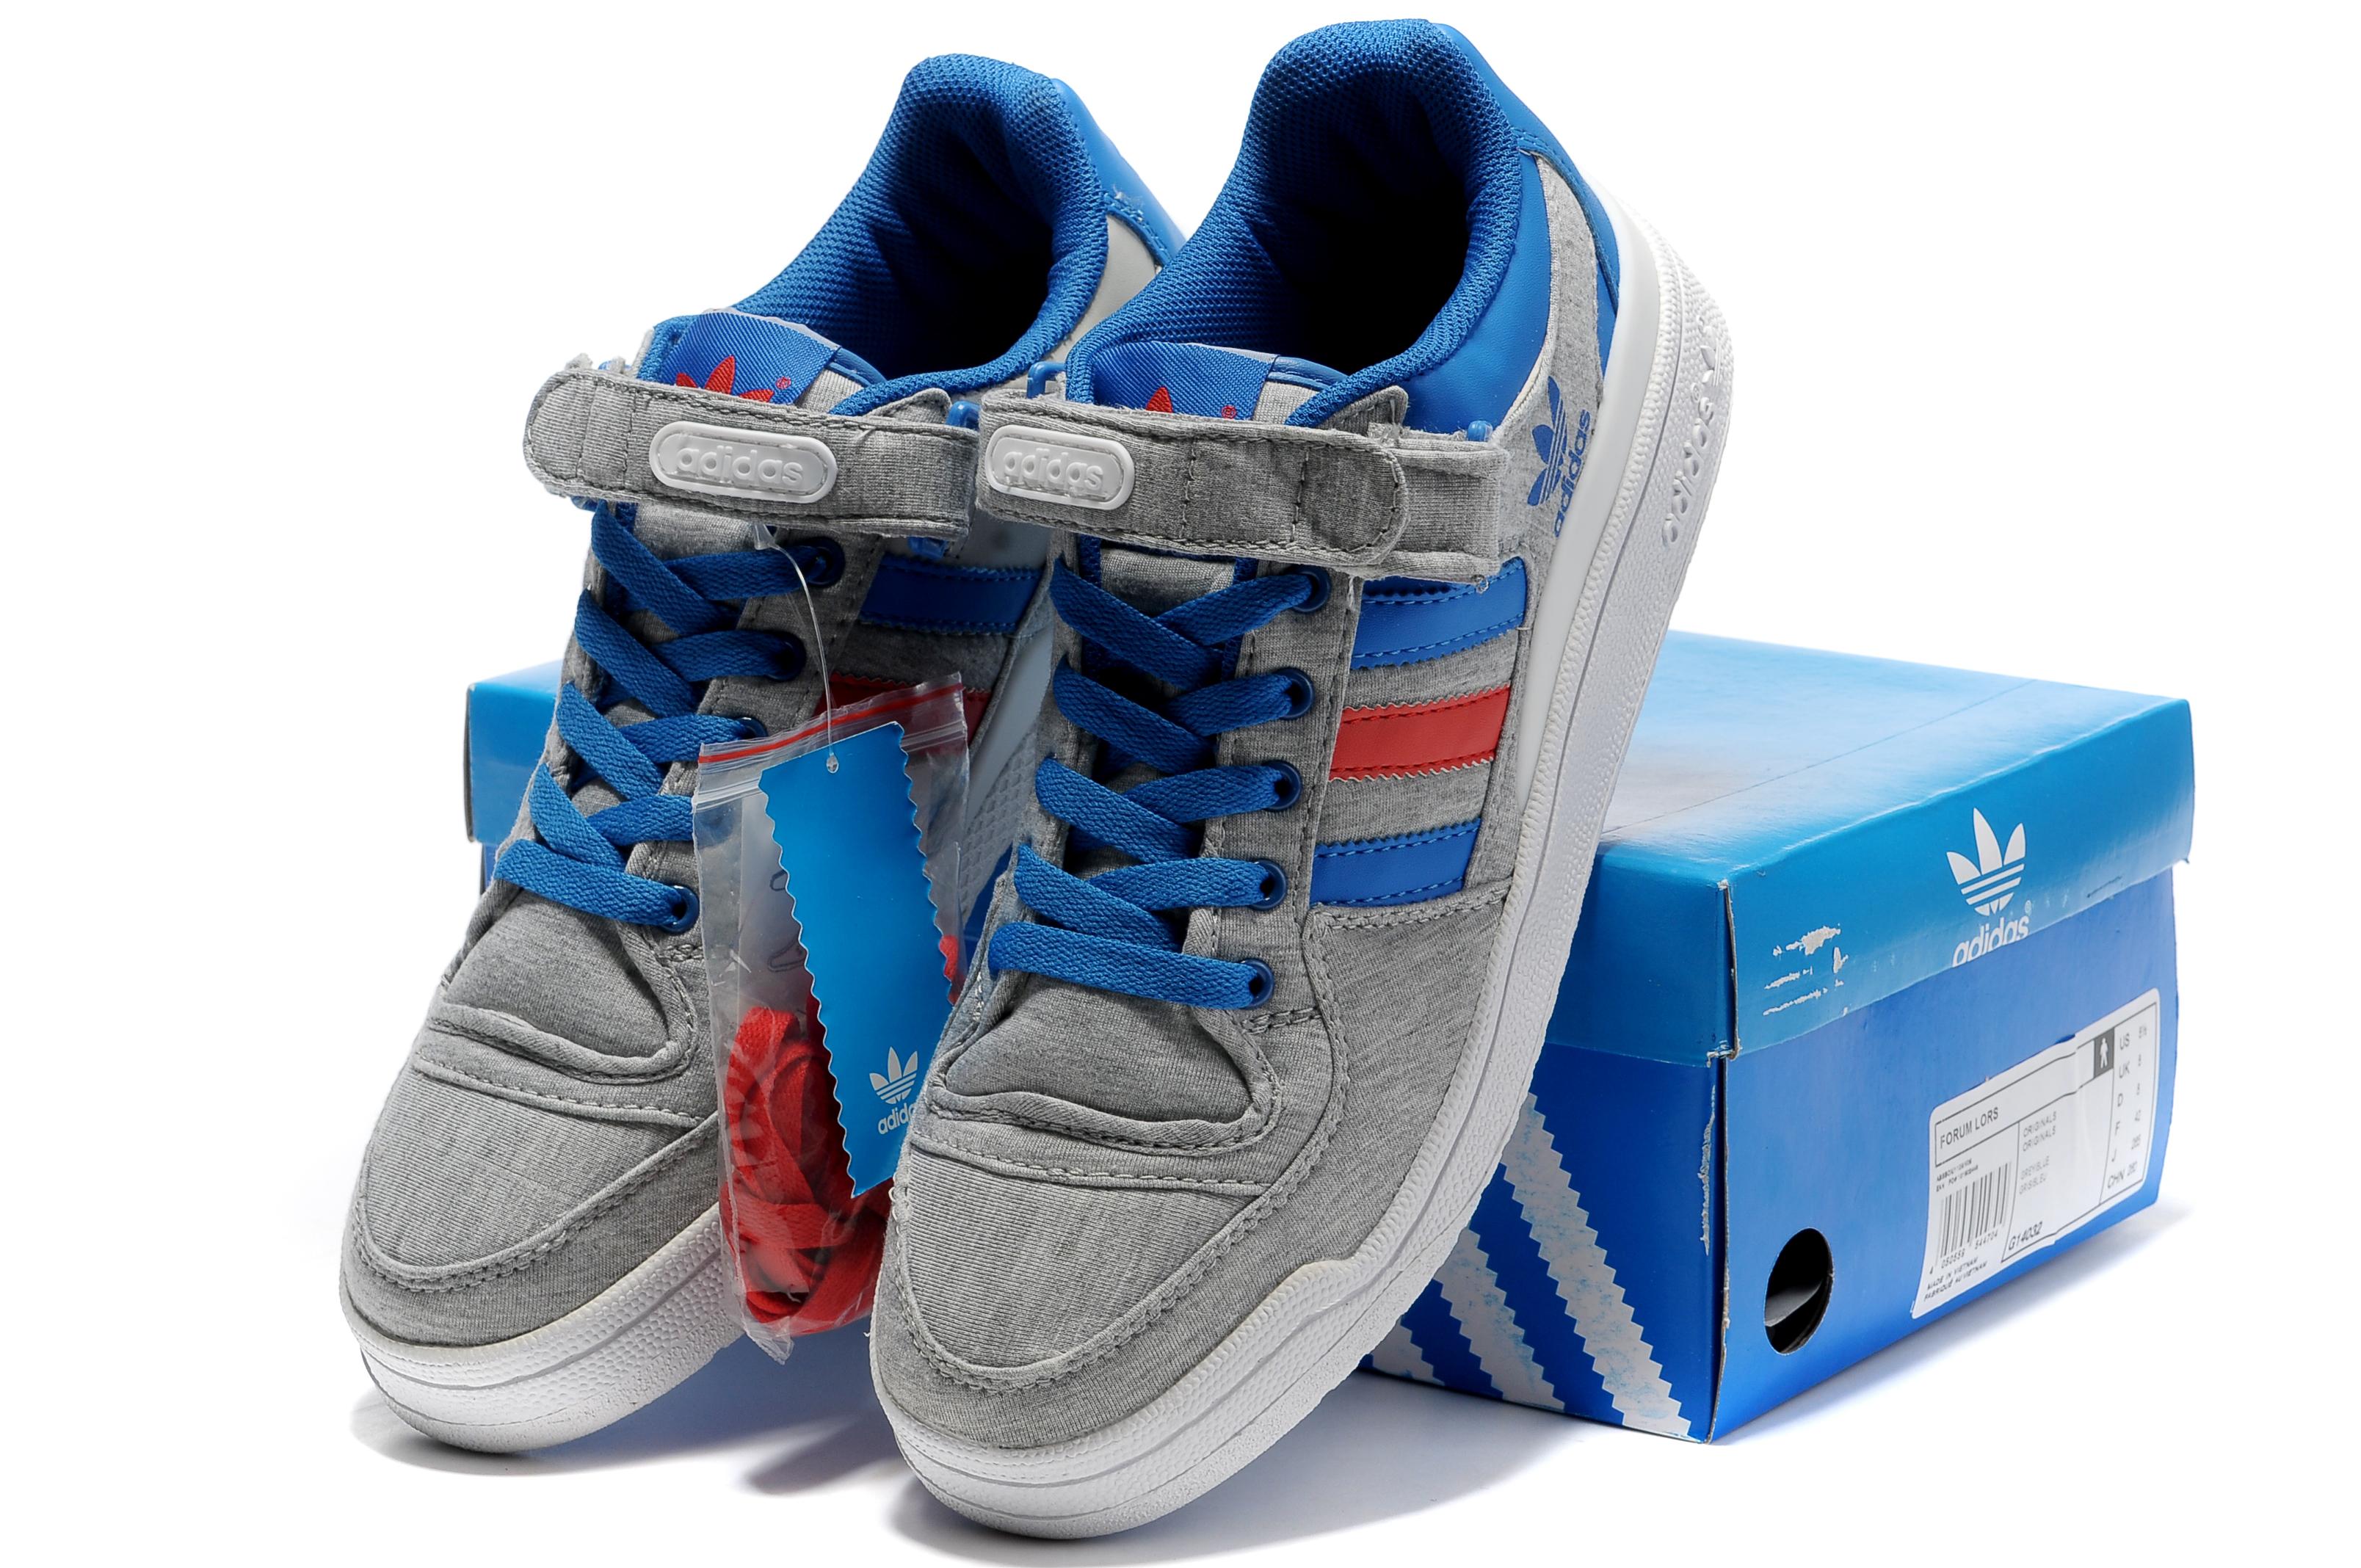 adidas夏天穿着不闷脚的板鞋 有没有一个阿迪2011新款鞋子